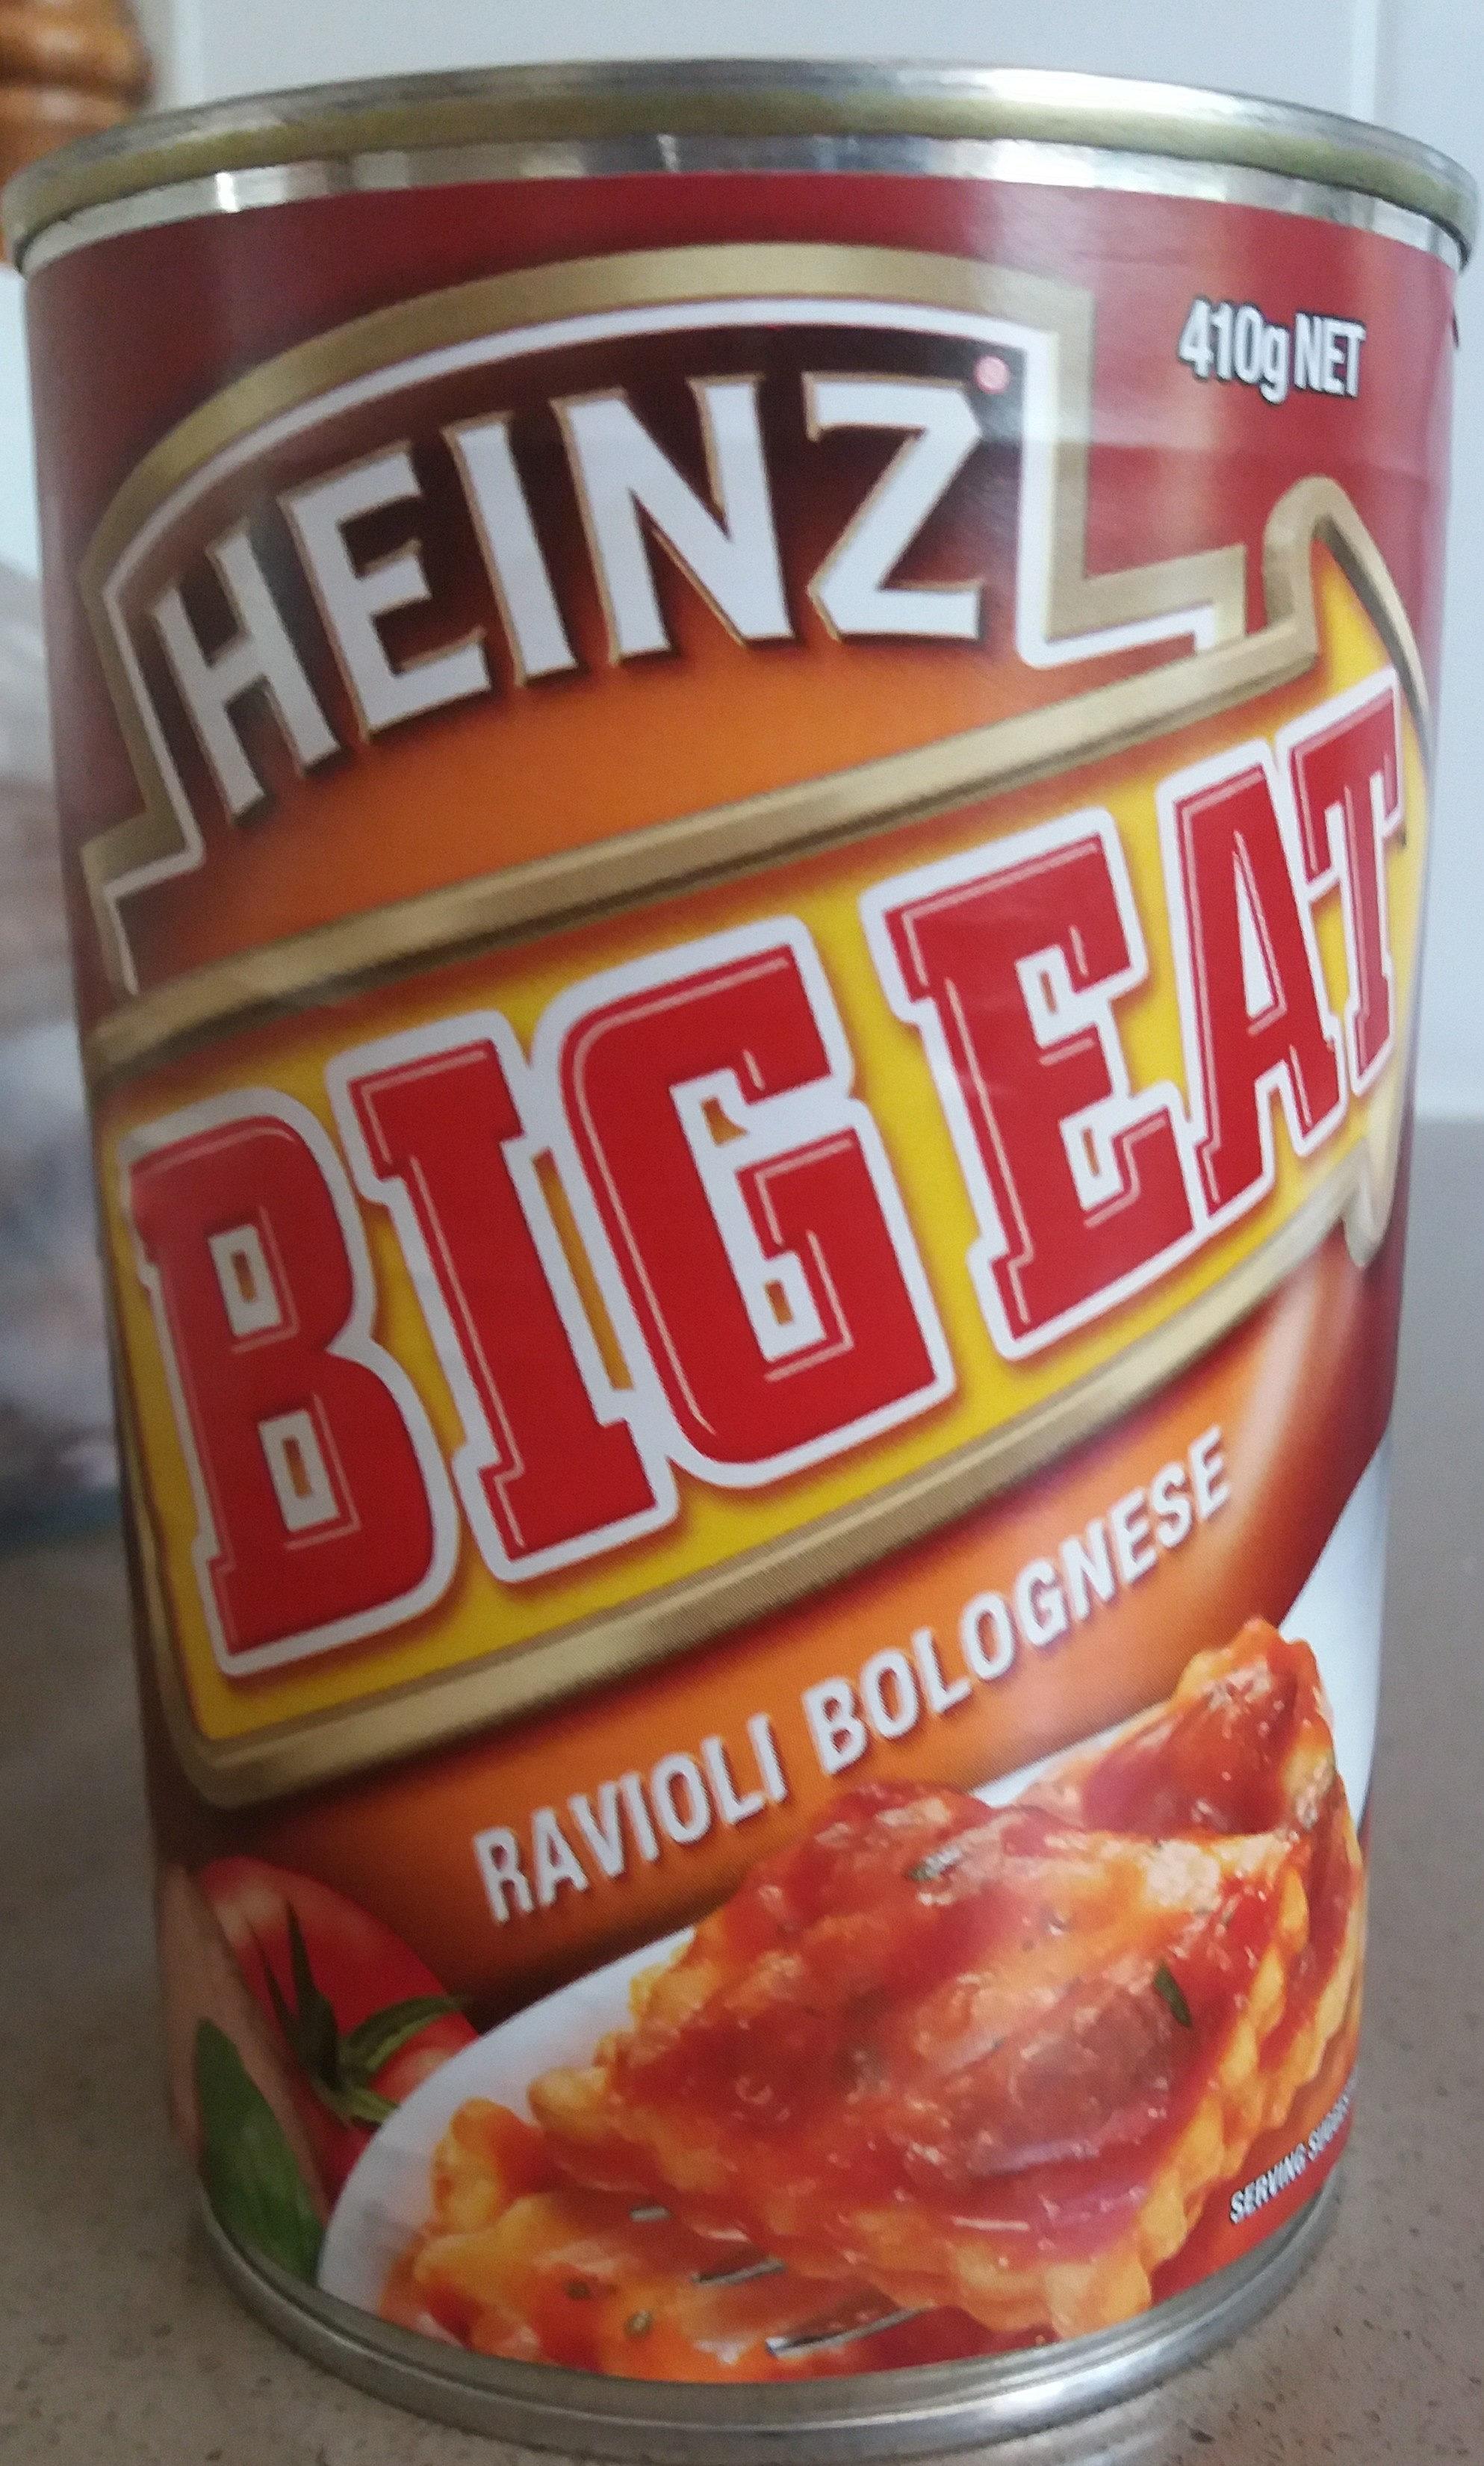 Big Eat Ravioli bolognese - Product - en